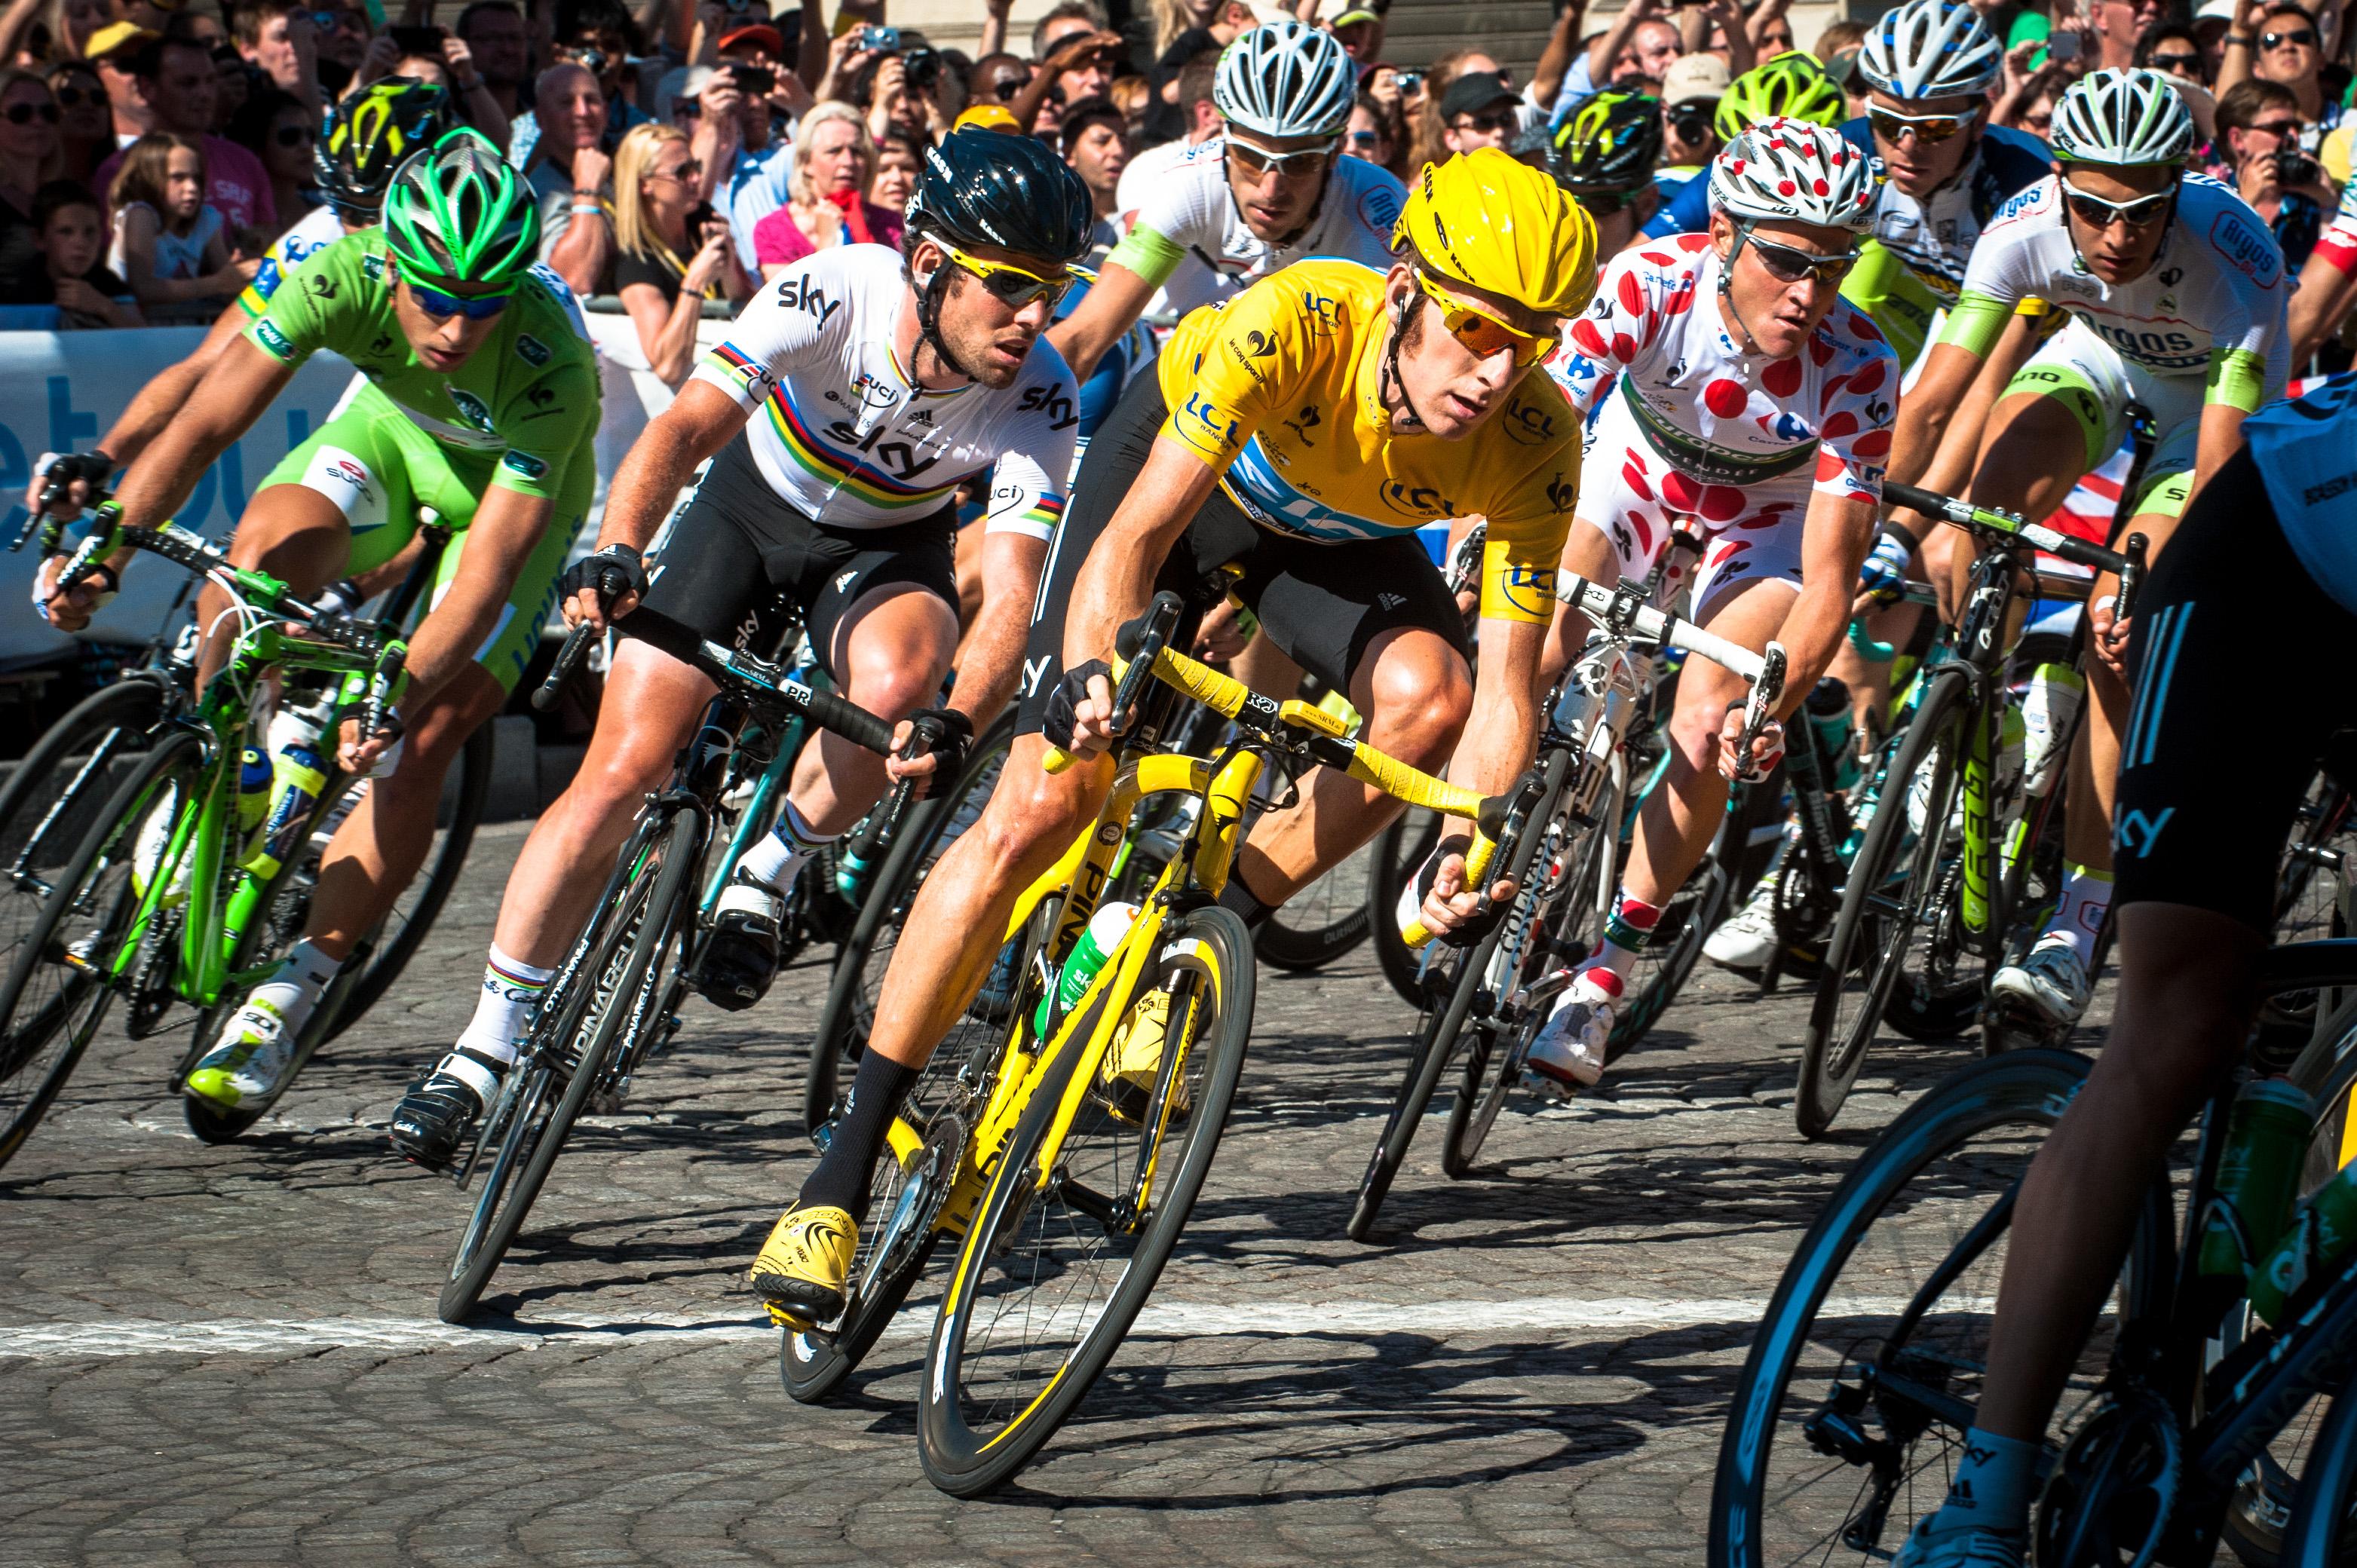 Tour De France HD Wallpaper 874 Wallpaper Viewallpapercom 3126x2080